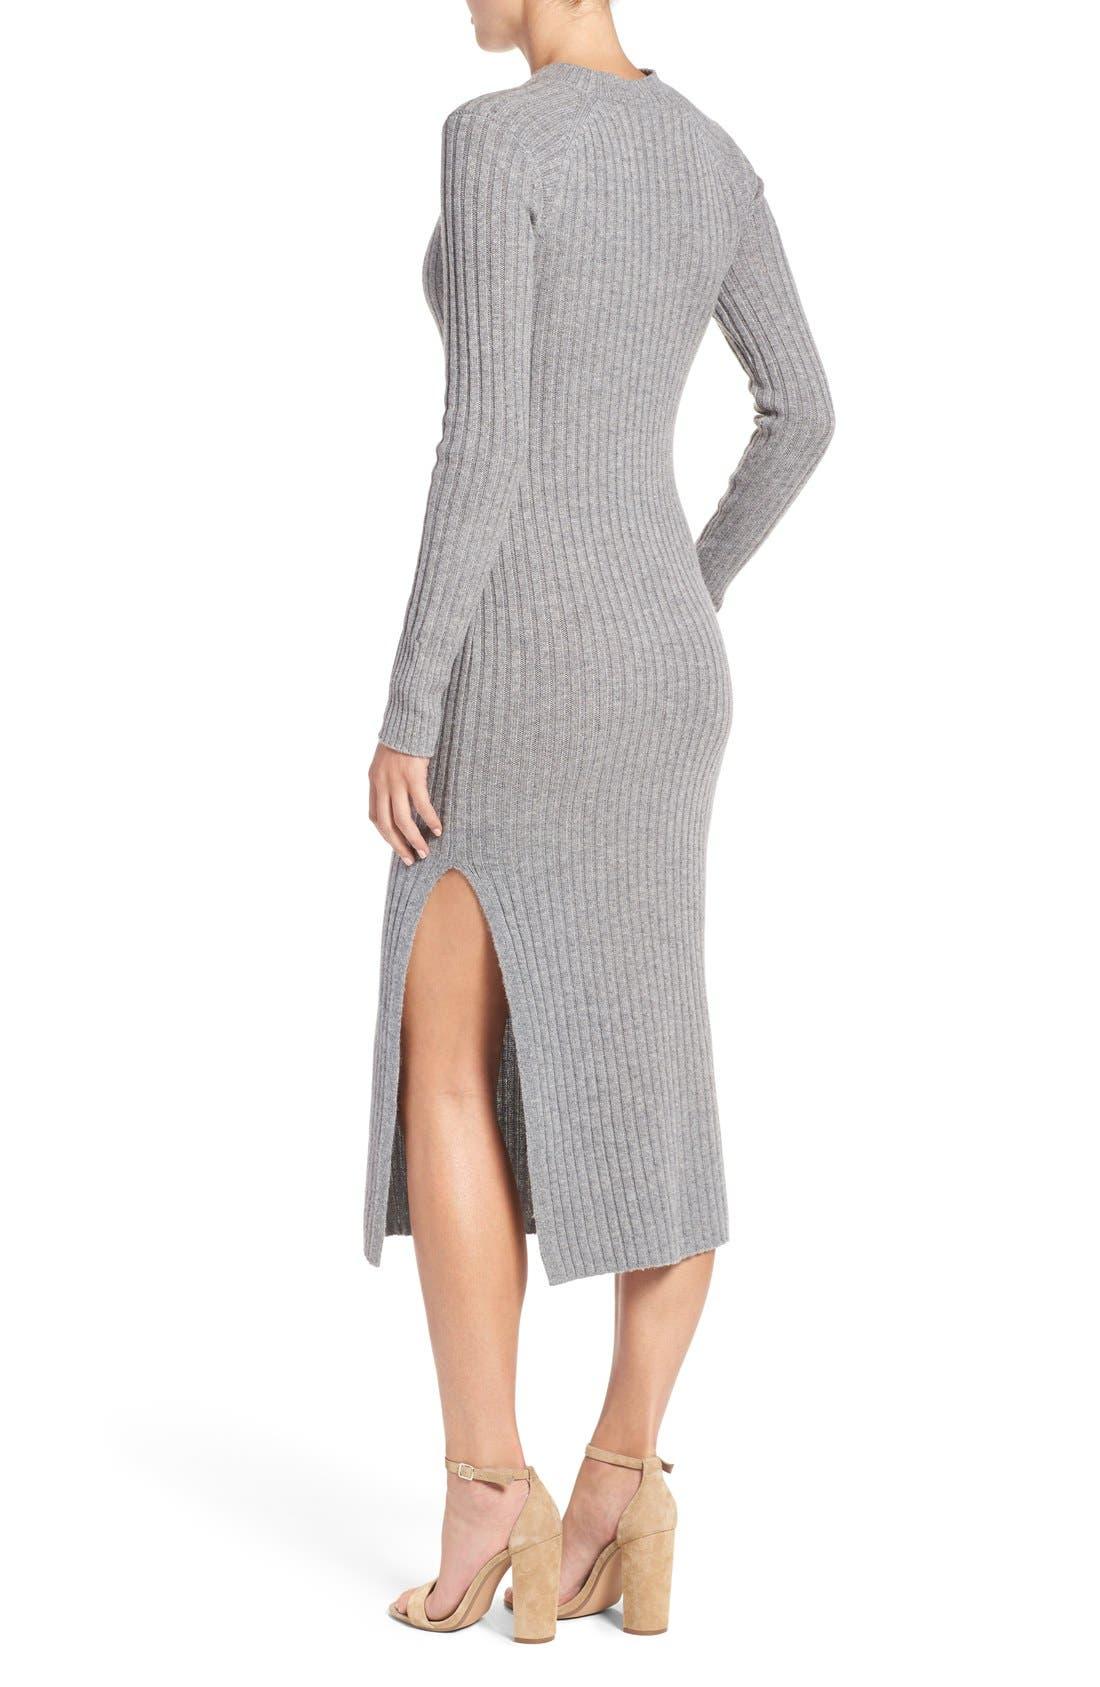 Reign Merino Wool & Cashmere Sweater Midi Dress,                             Alternate thumbnail 2, color,                             Medium Heather Grey